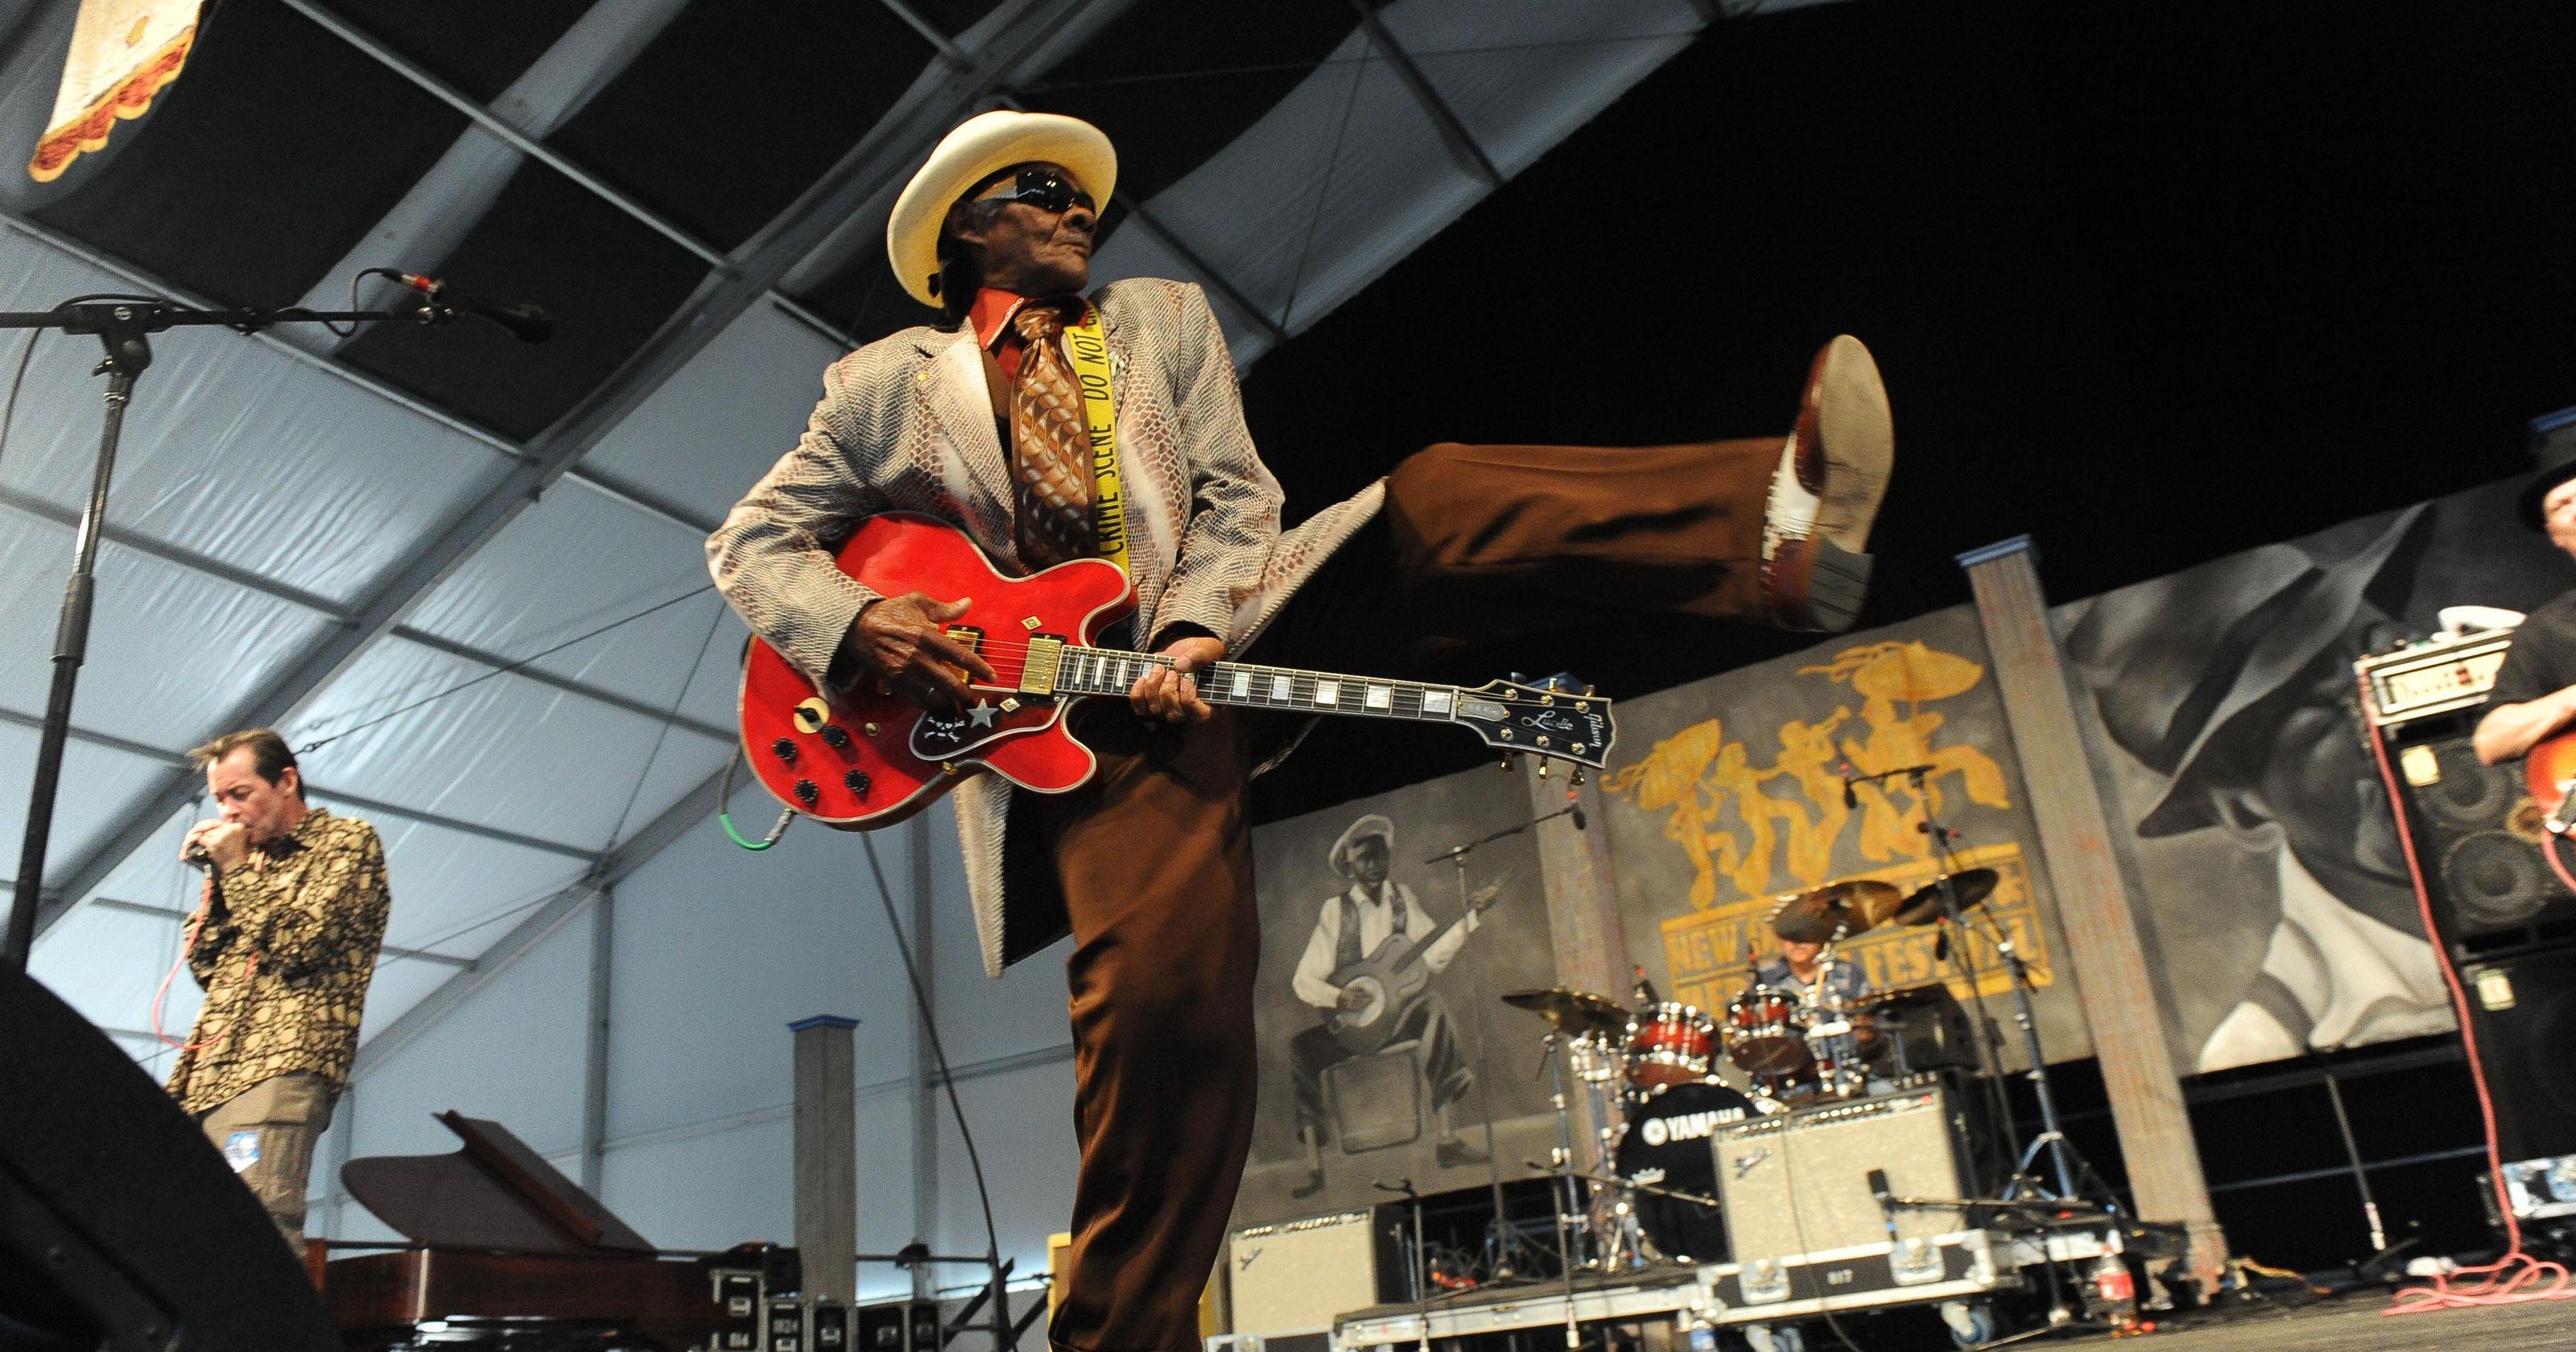 Нью-Орлеанский джазовый фестиваль http://travelcalendar.ru/wp-content/uploads/2015/11/B9316949728Z.1_20150412155401_000_GIVAFR8KM.1-0.jpg